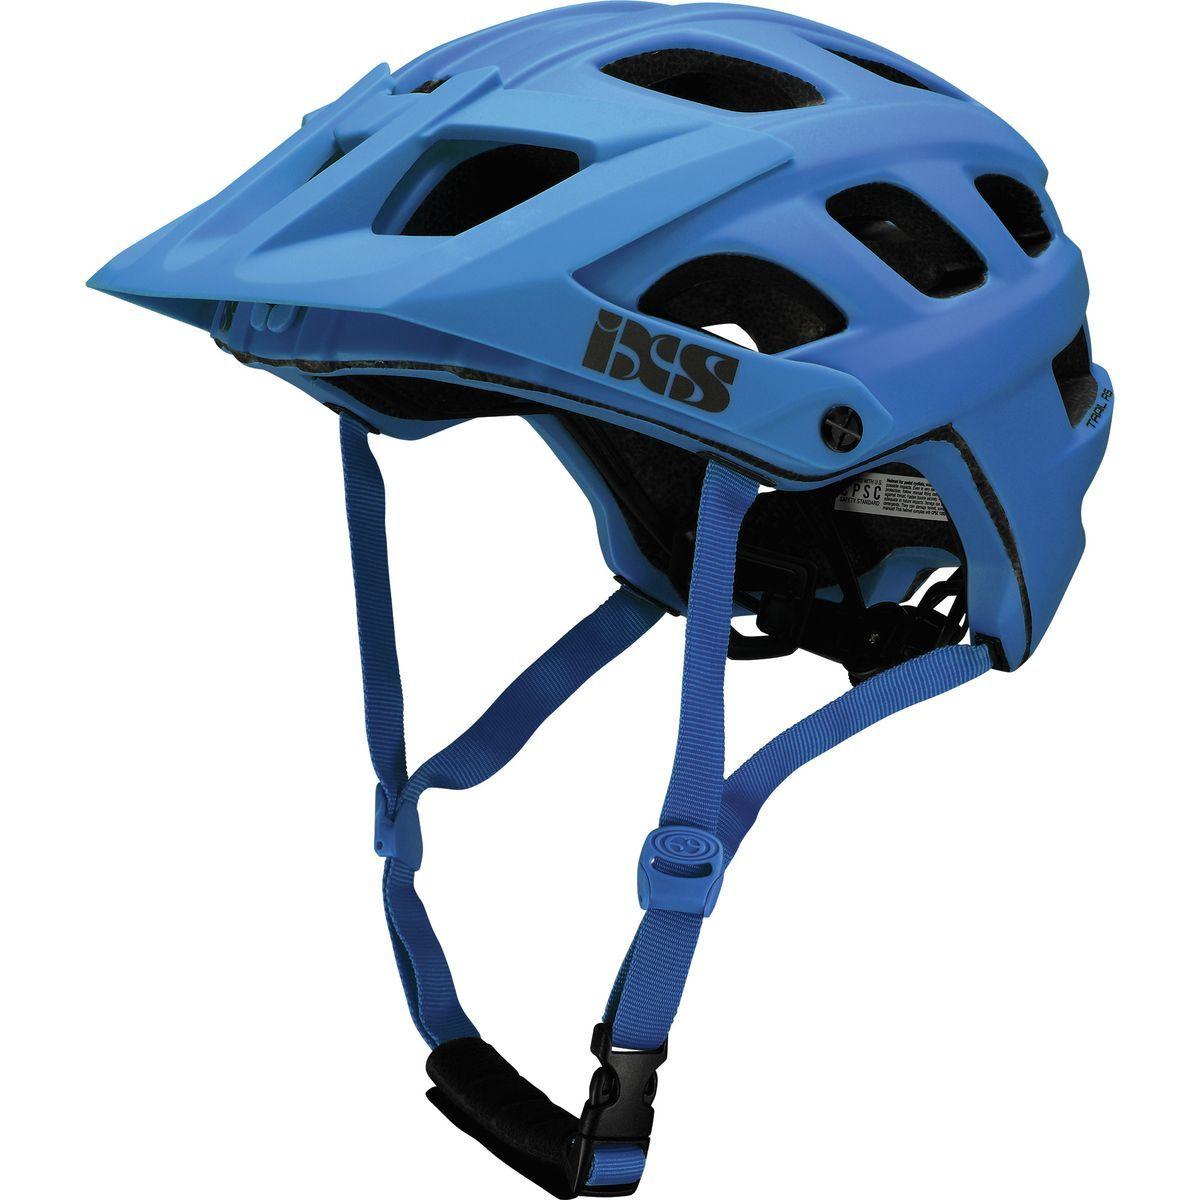 Ixs Trail Rs Evo Helmet Helmet All Mountain Bike Evo